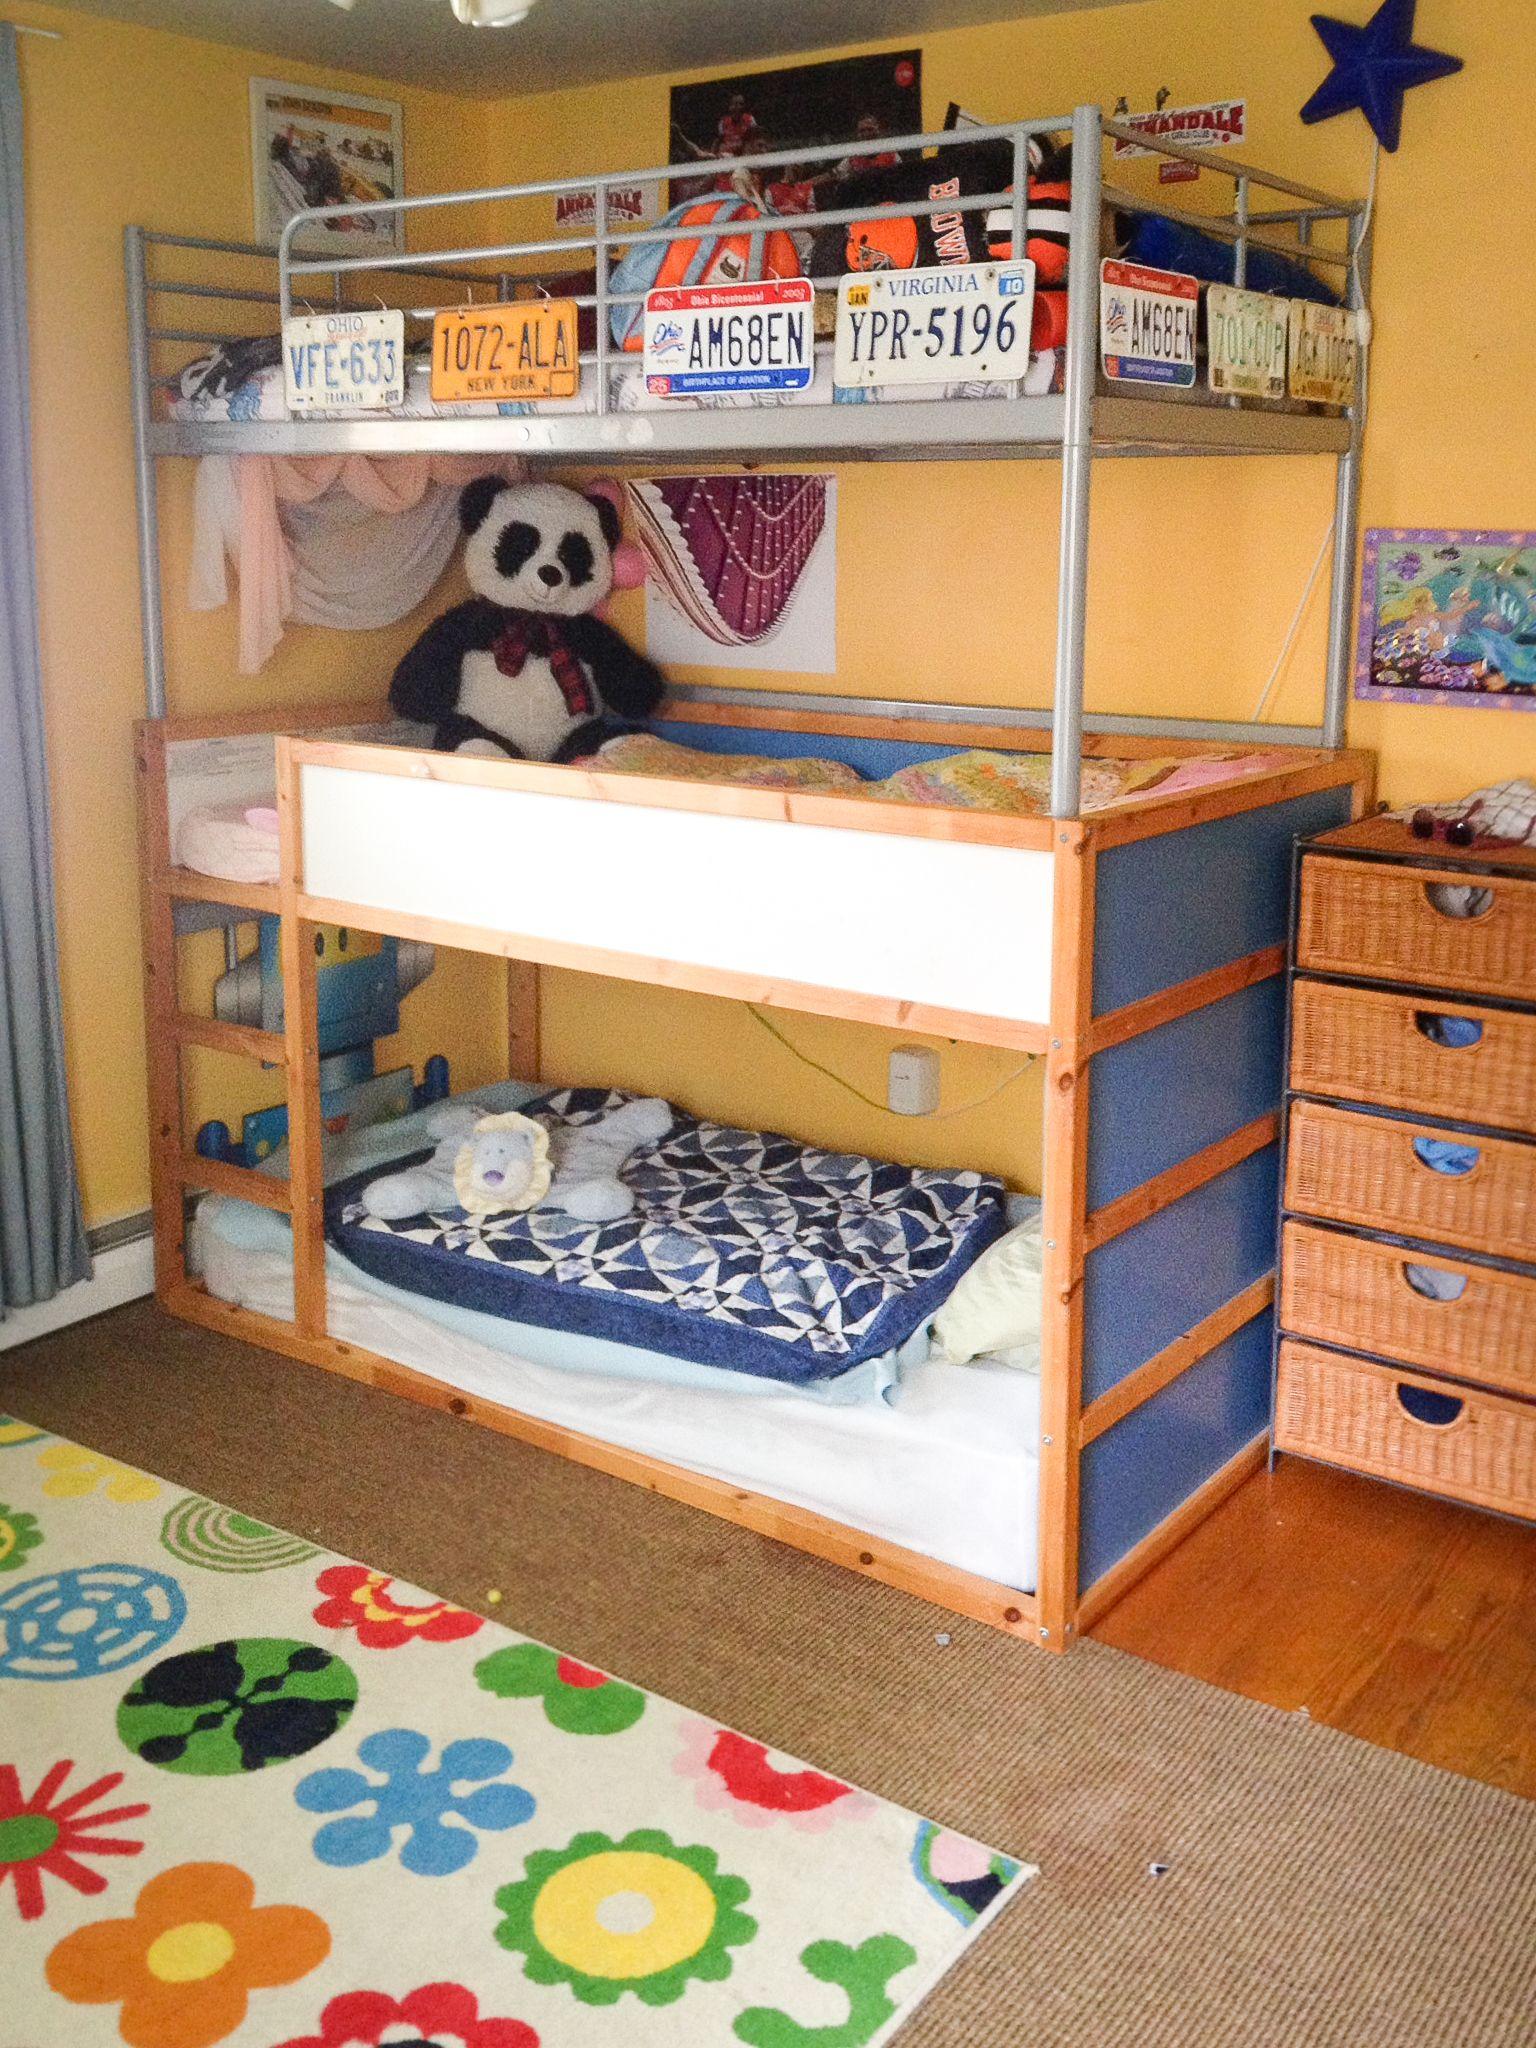 Triple Bunk Bed – Ikea (sorta) Hack